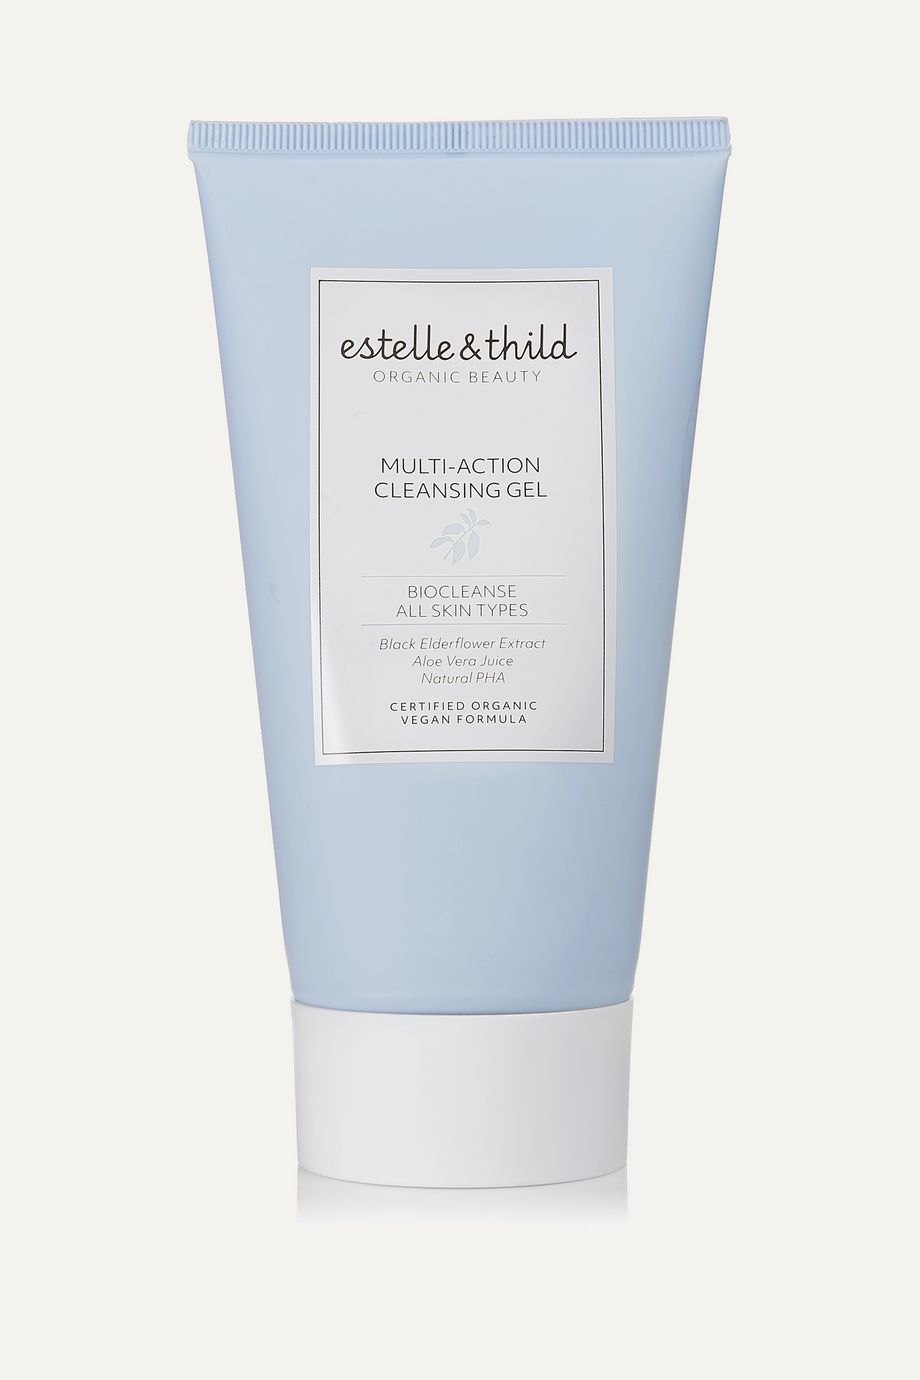 Estelle & Thild BioCleanse Multi-Action Cleansing Gel, 150ml